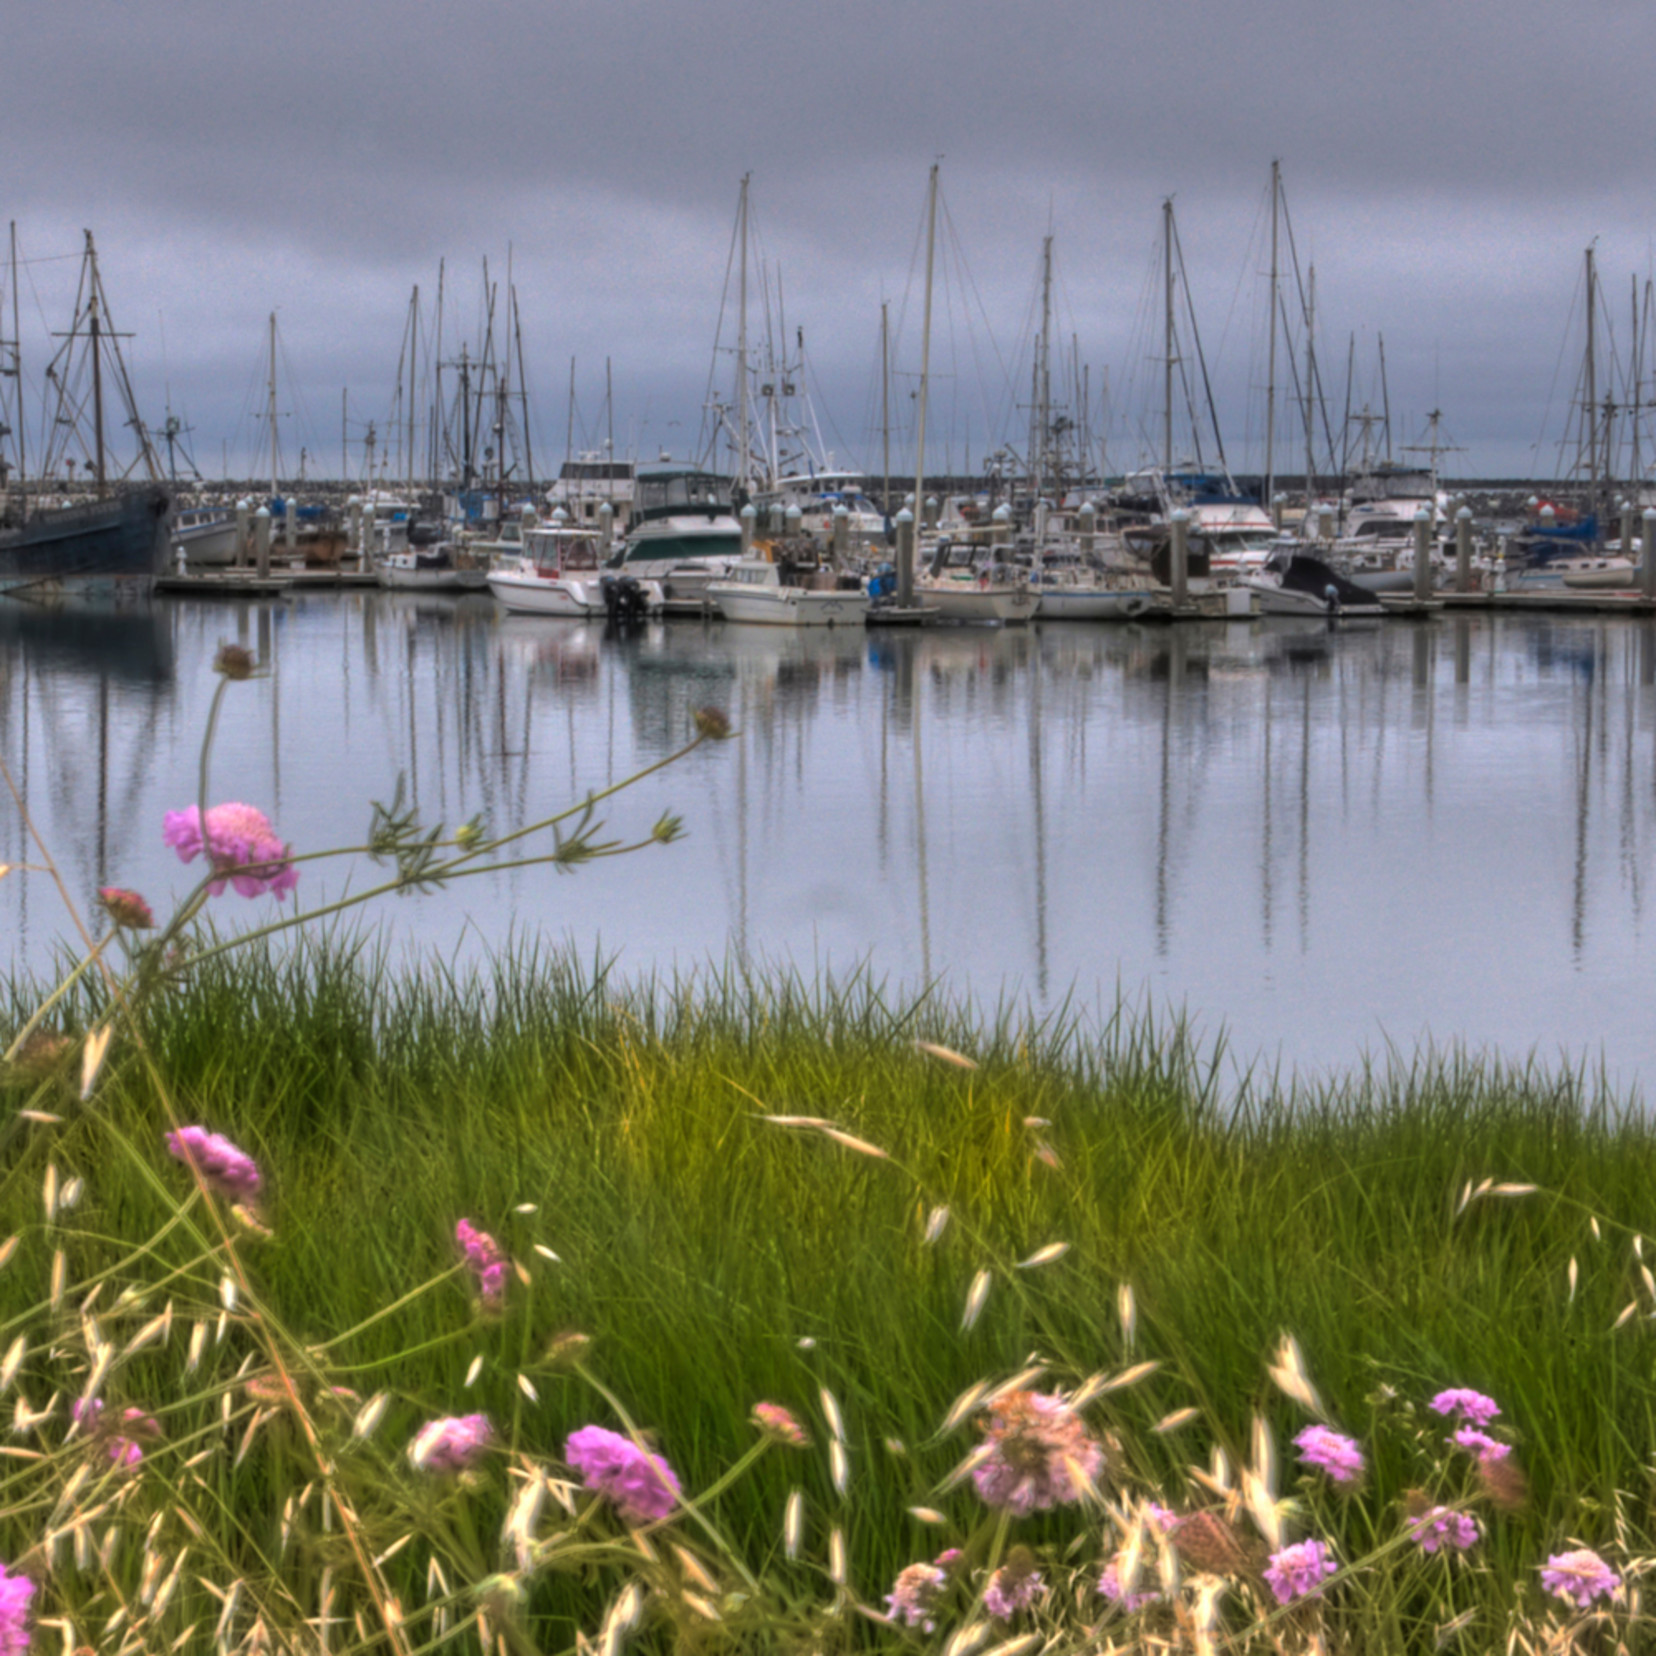 Harborboats2 oatsrt